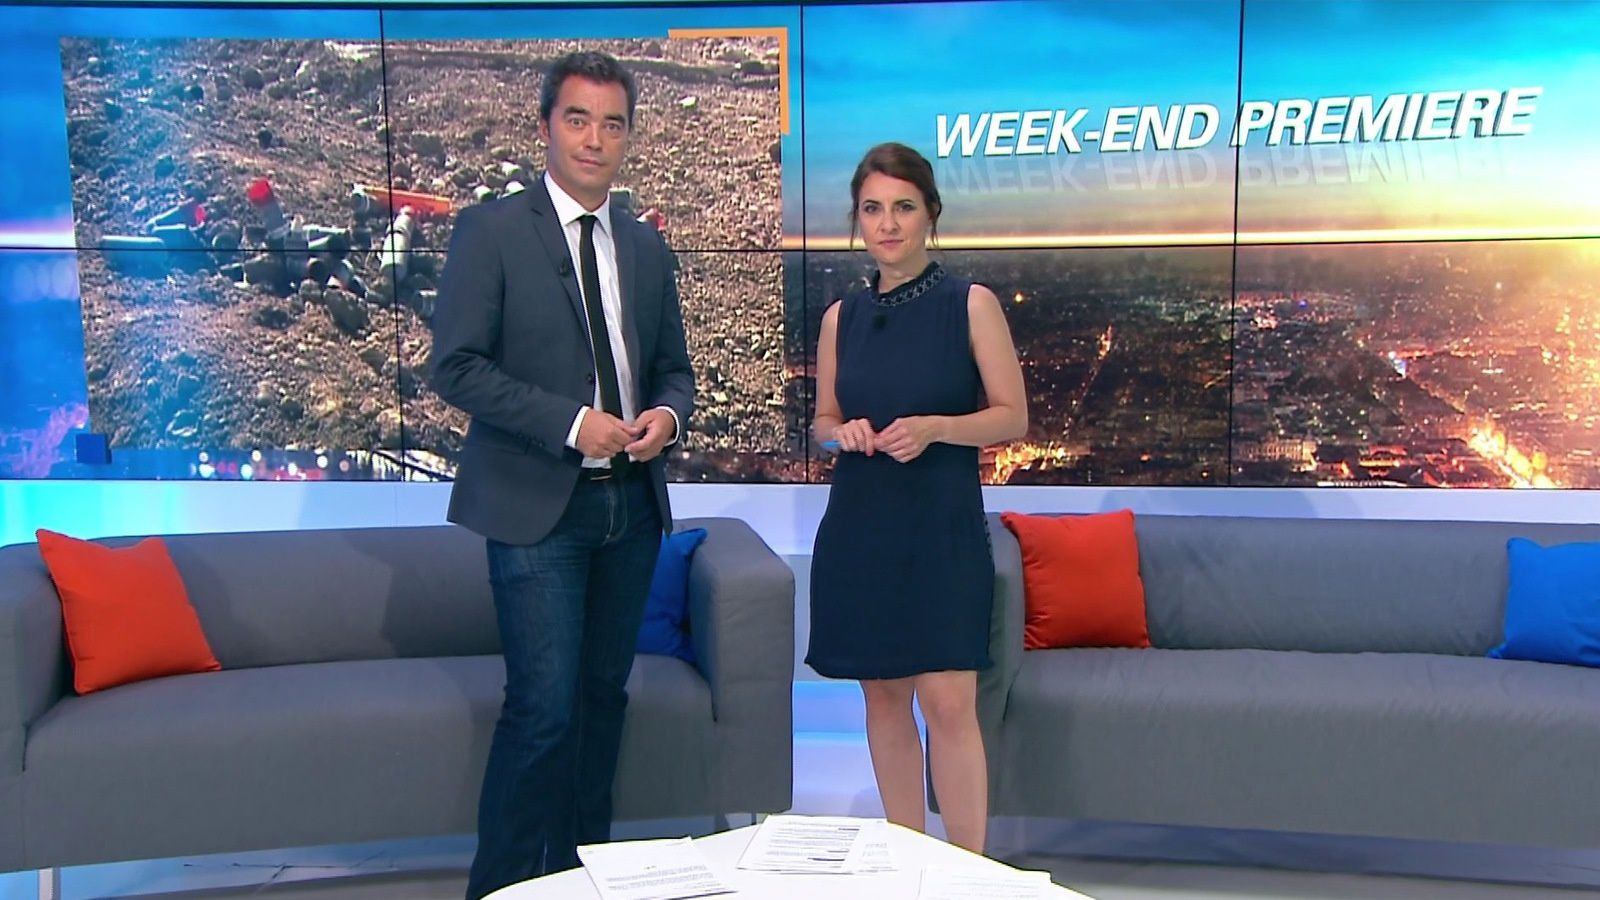 📸6 WEEK-END PREMIERE @BFMTV @BFMTVmatinaleWE @SandraGandoin @JohannaCarlosD8 ce matin #vuesalatele